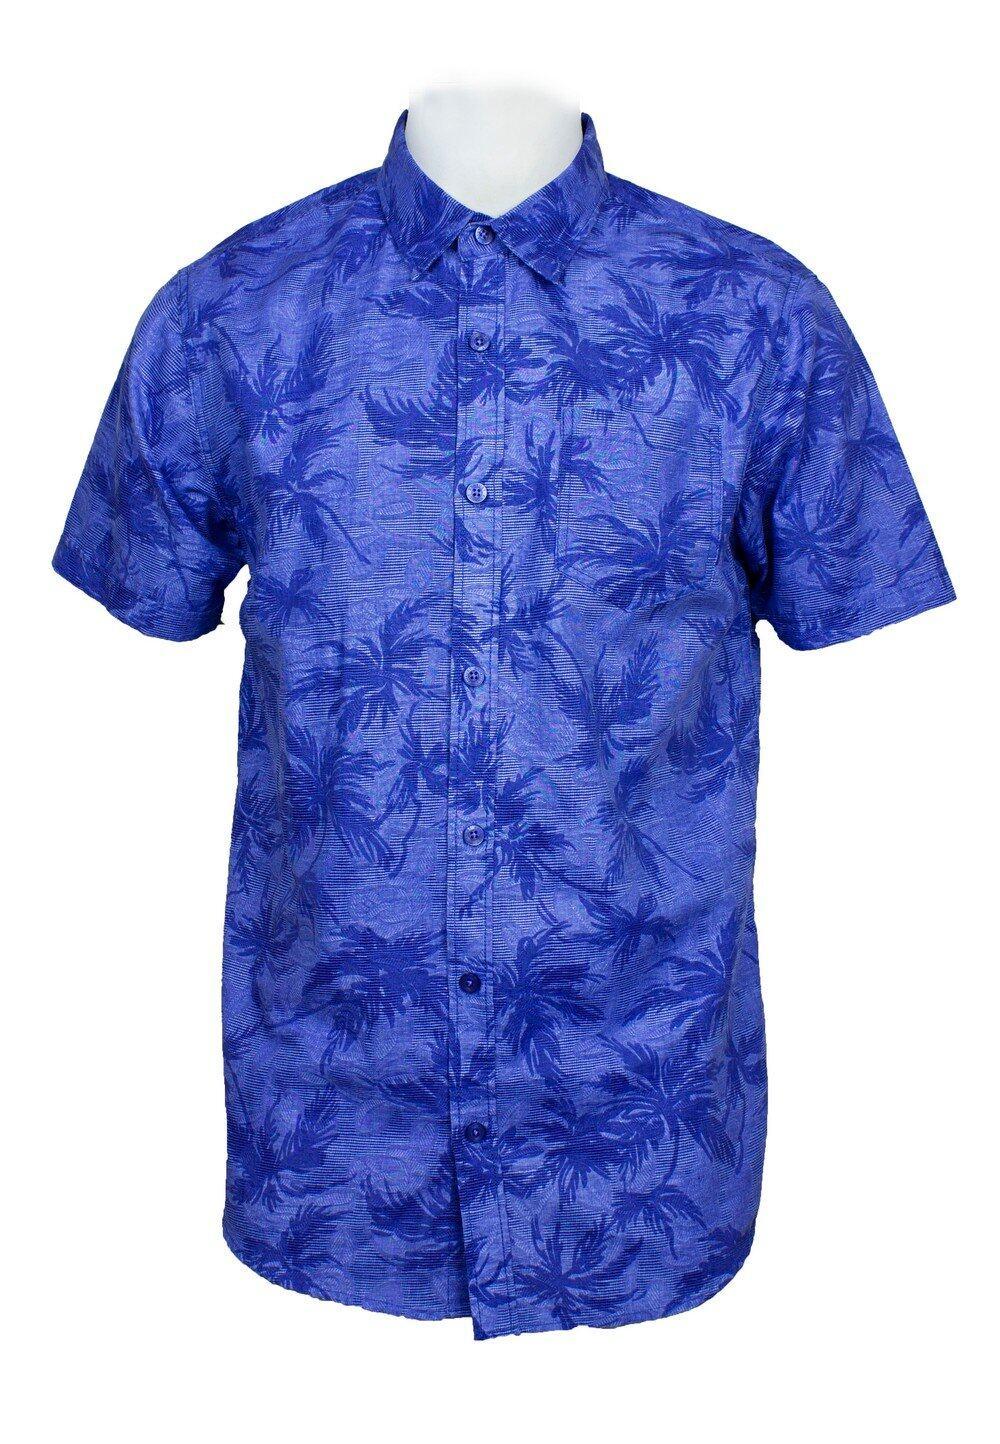 Short Sleeve Shirt with Flower Print-812